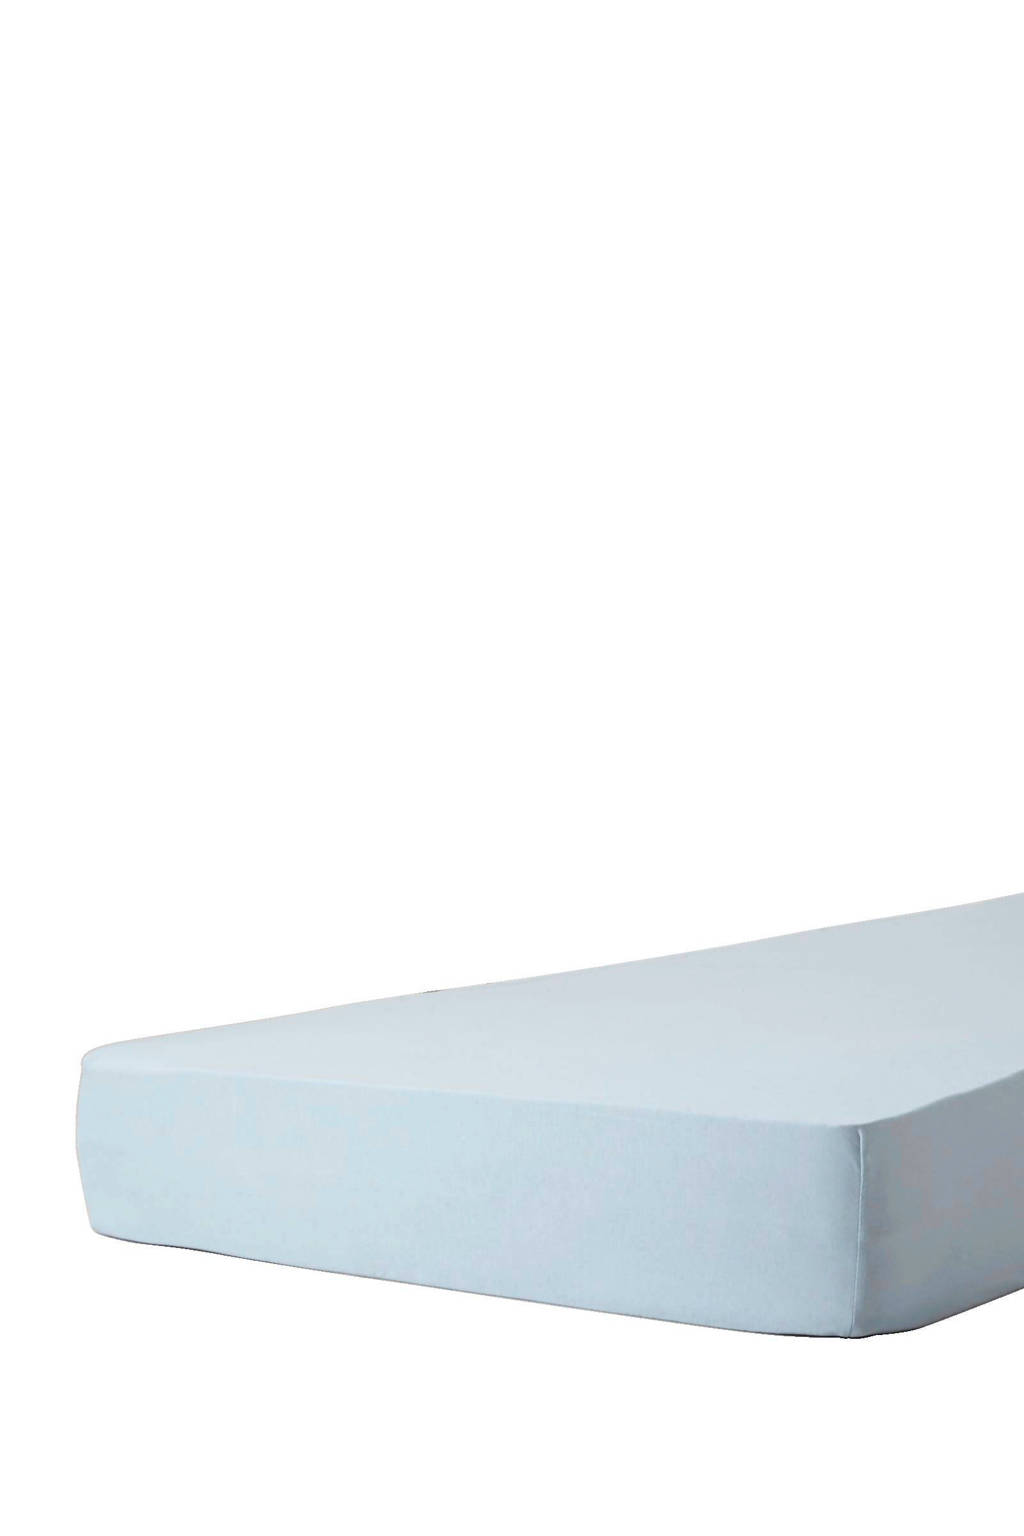 Beddinghouse jersey premium hoeslaken Lichtblauw